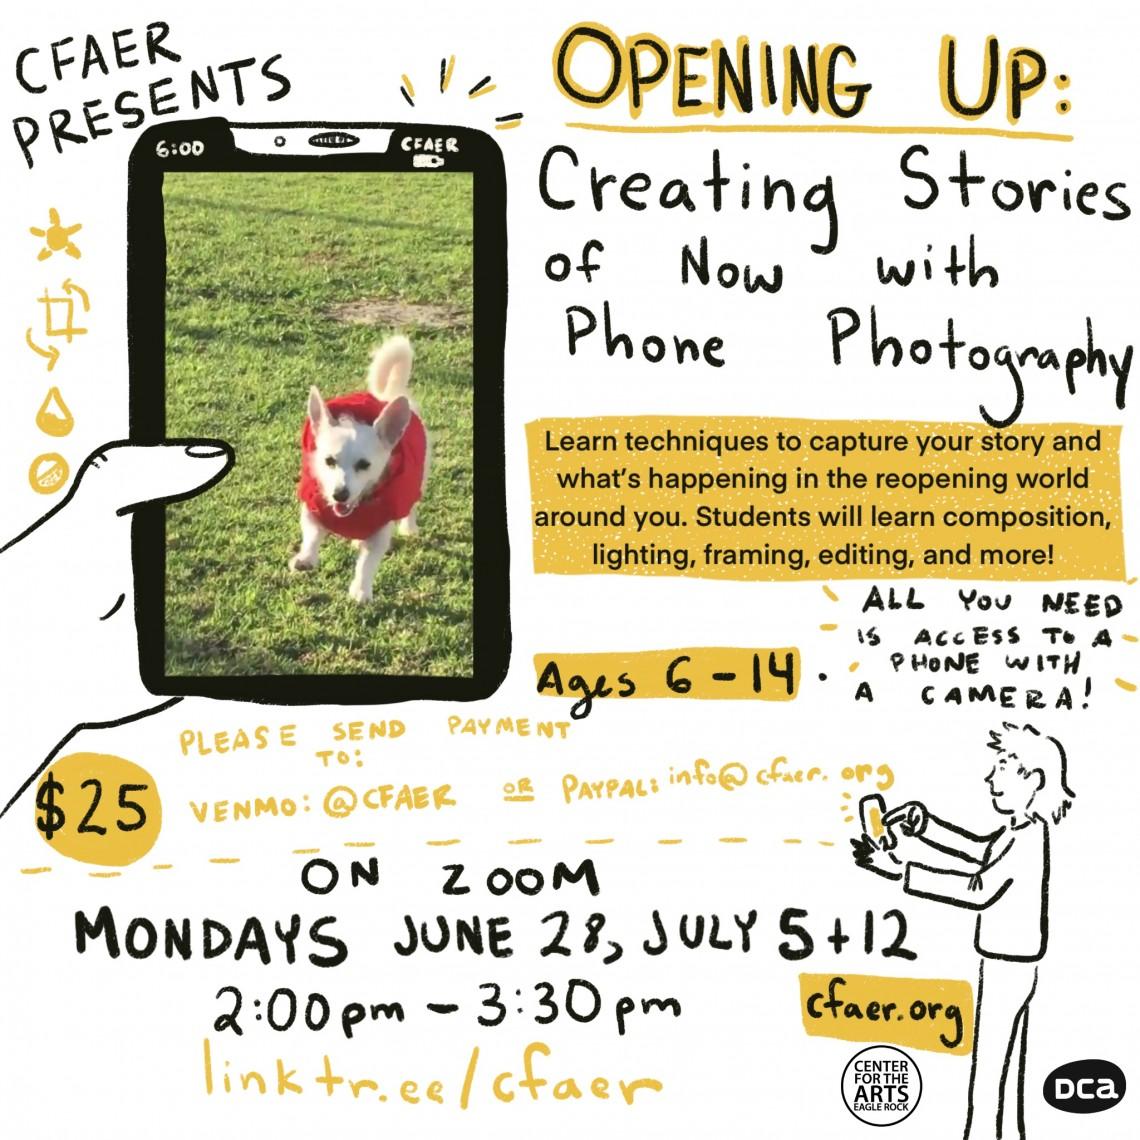 Opening Up: Narrative Phone Photography Workshop